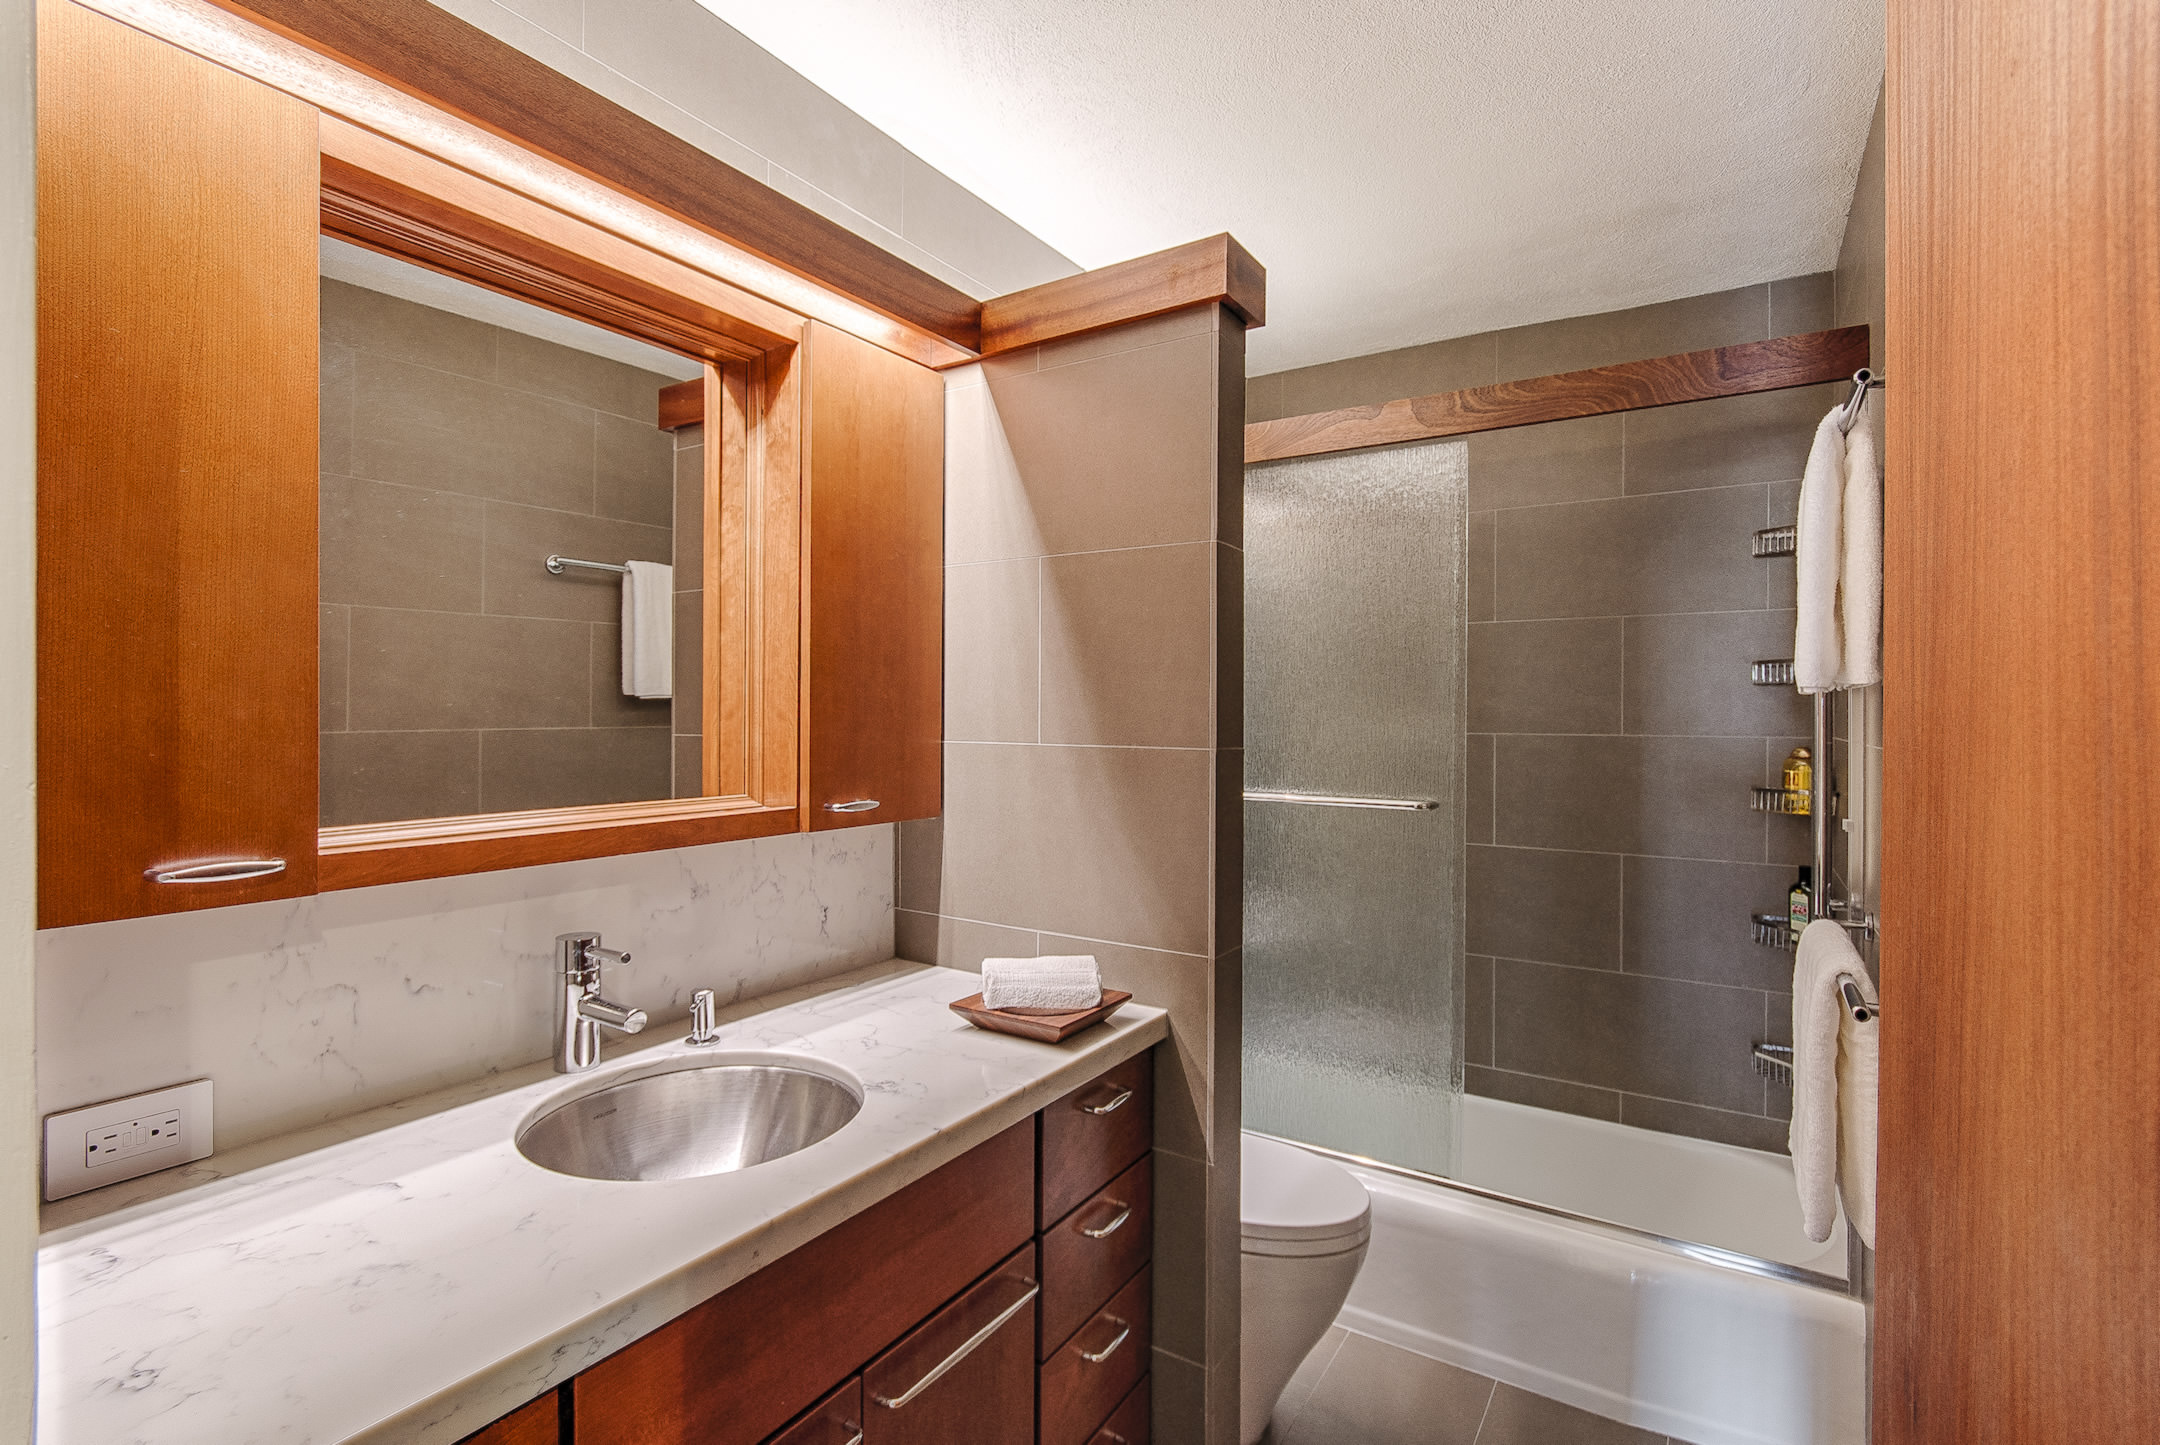 Bathroom remodeling honolulu - Bathroom Downtown Honolulu Apartment Renovation